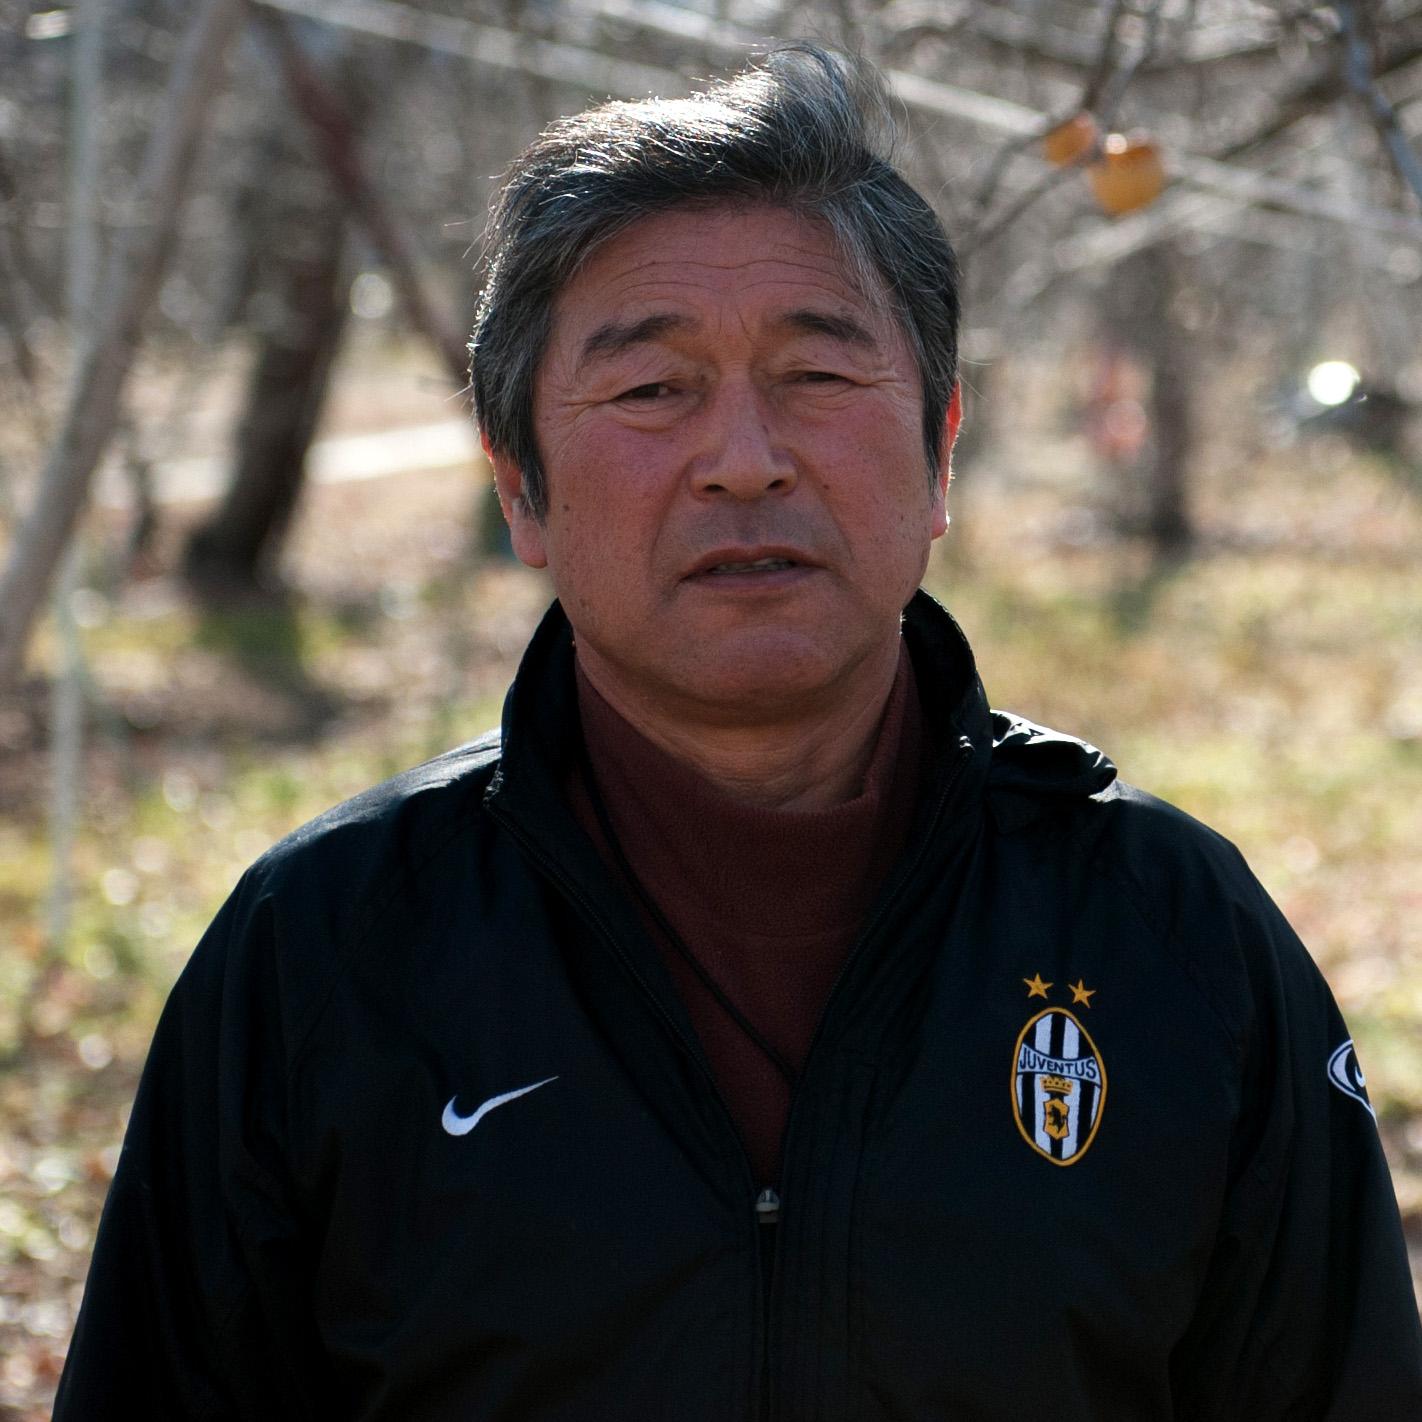 Caption: Fukushima Survivor, Kenichi Hasegawa, Credit: Greenpeace